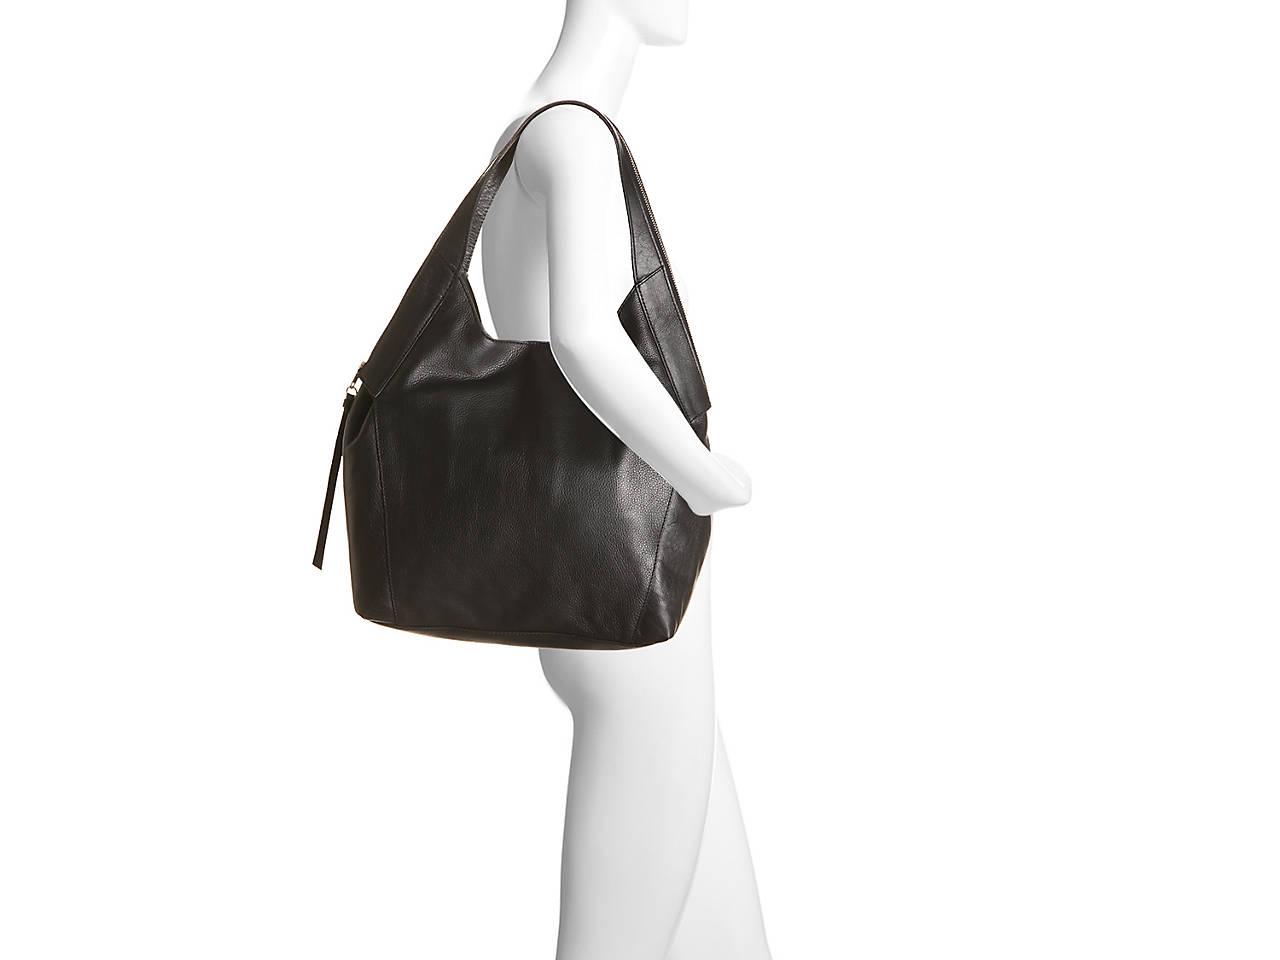 6be352857 Kooba Oakland Leather Hobo Bag Women's Handbags & Accessories | DSW